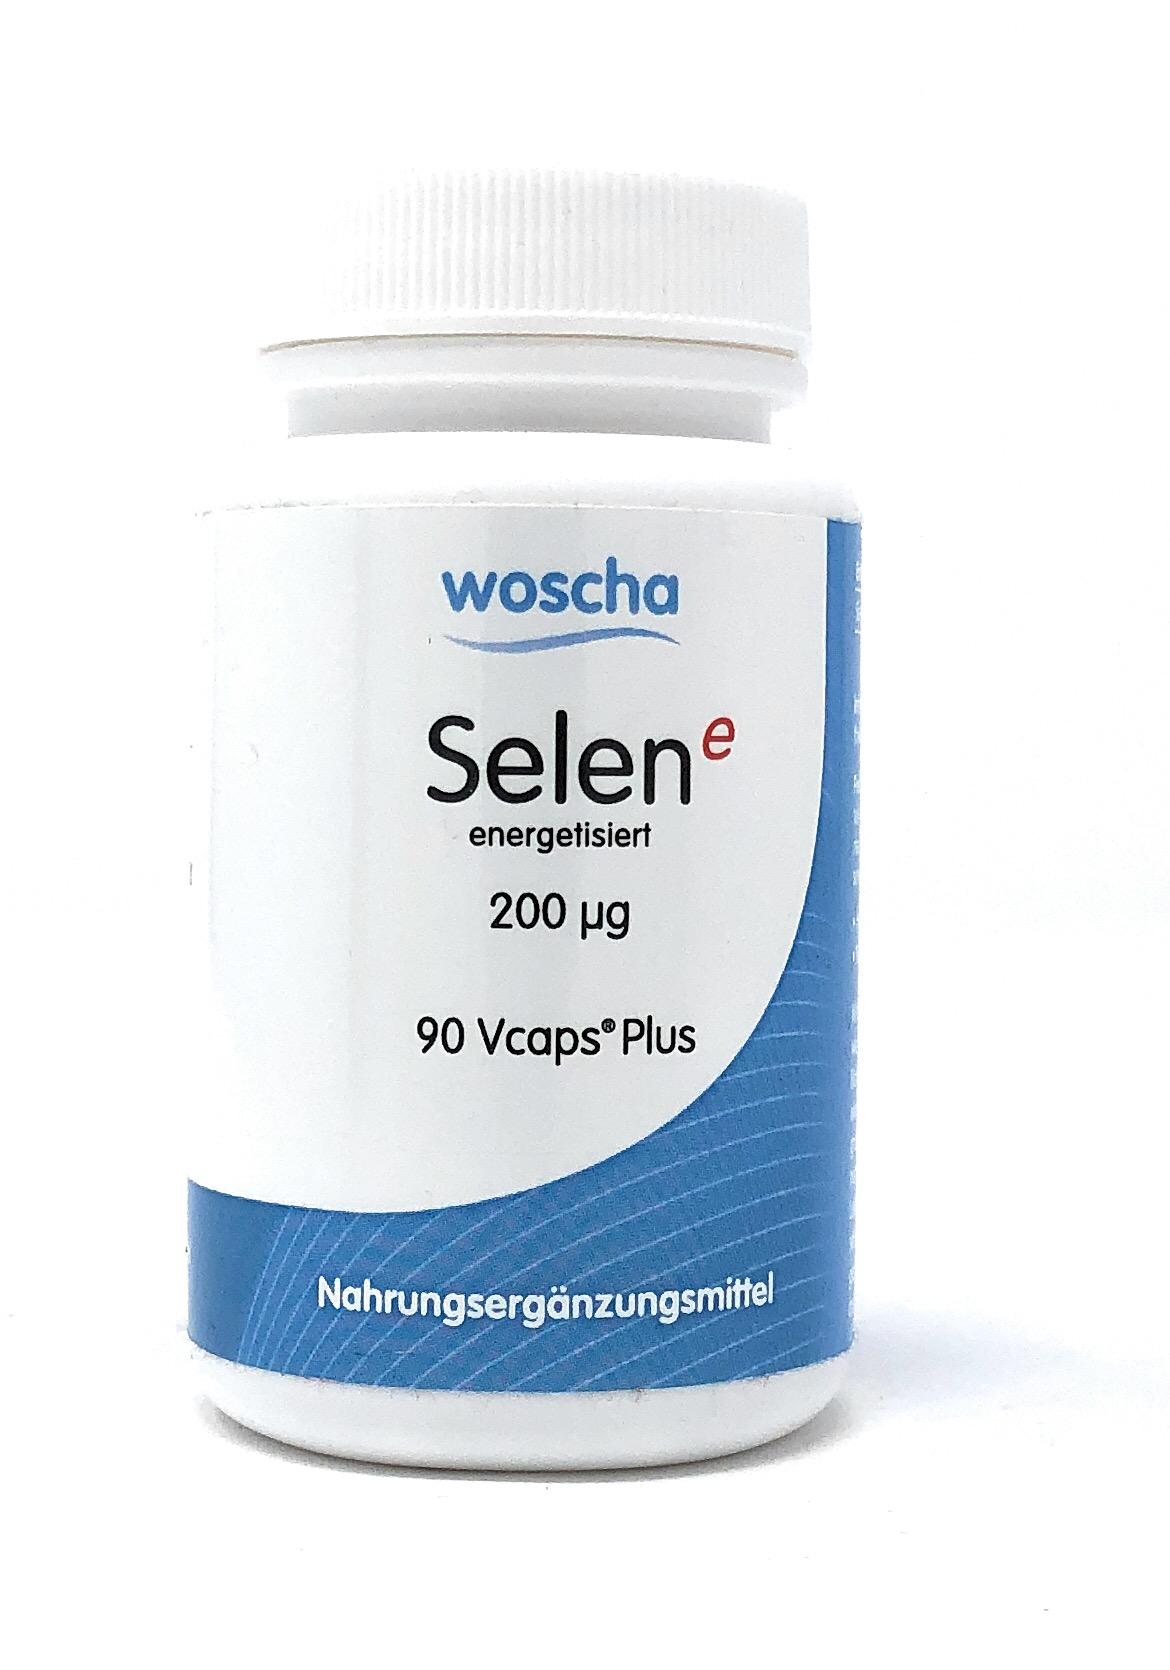 woscha Selen E energetisiert 200mcg (Selenmethionin) 90 Vcaps®Plus (18g) (vegan)